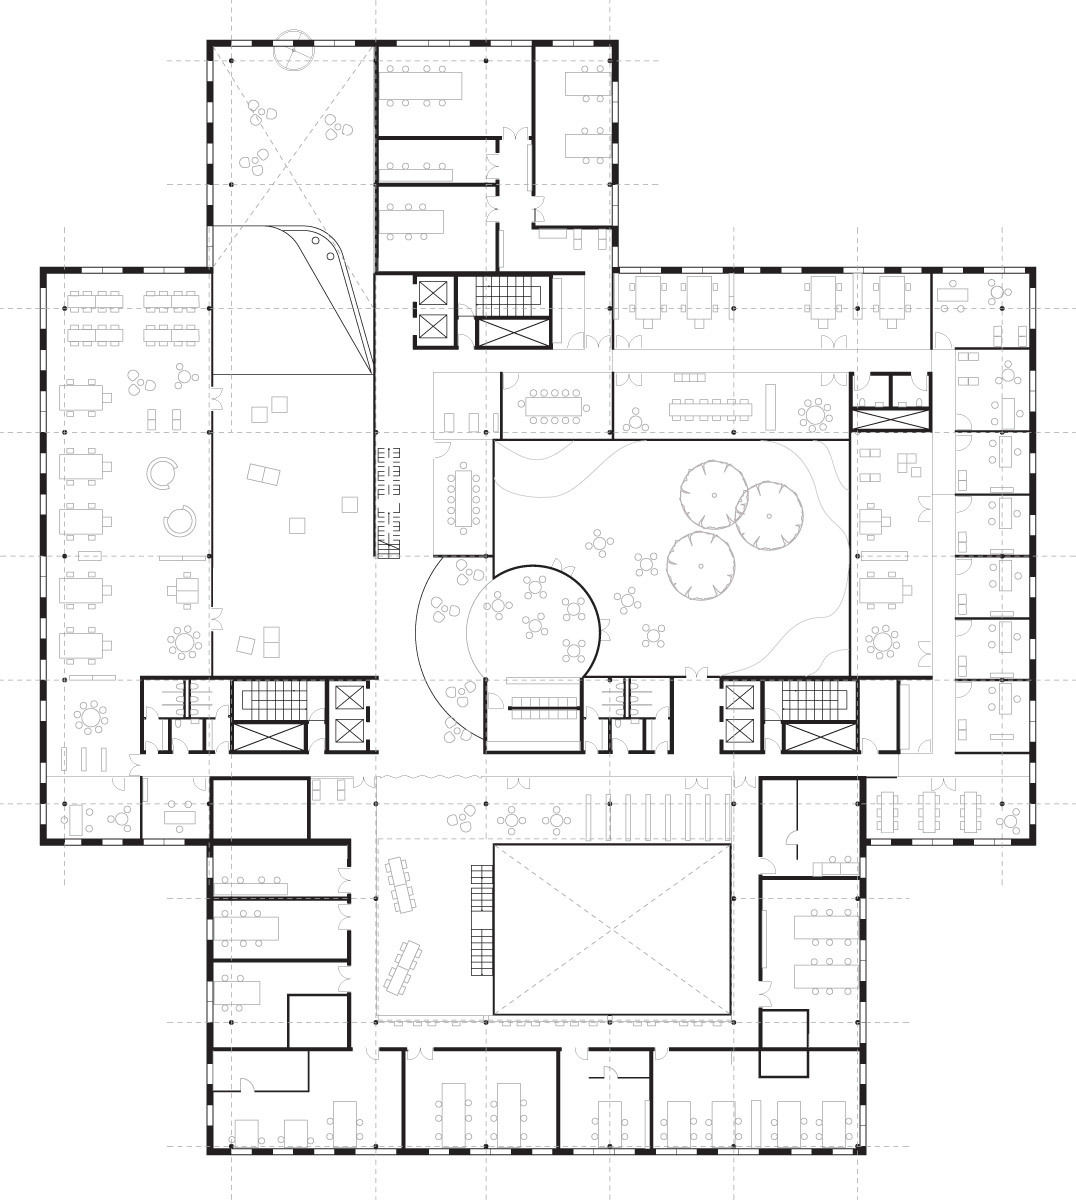 ZSW 01 PLAN (Image: Henning Larsen Architects)